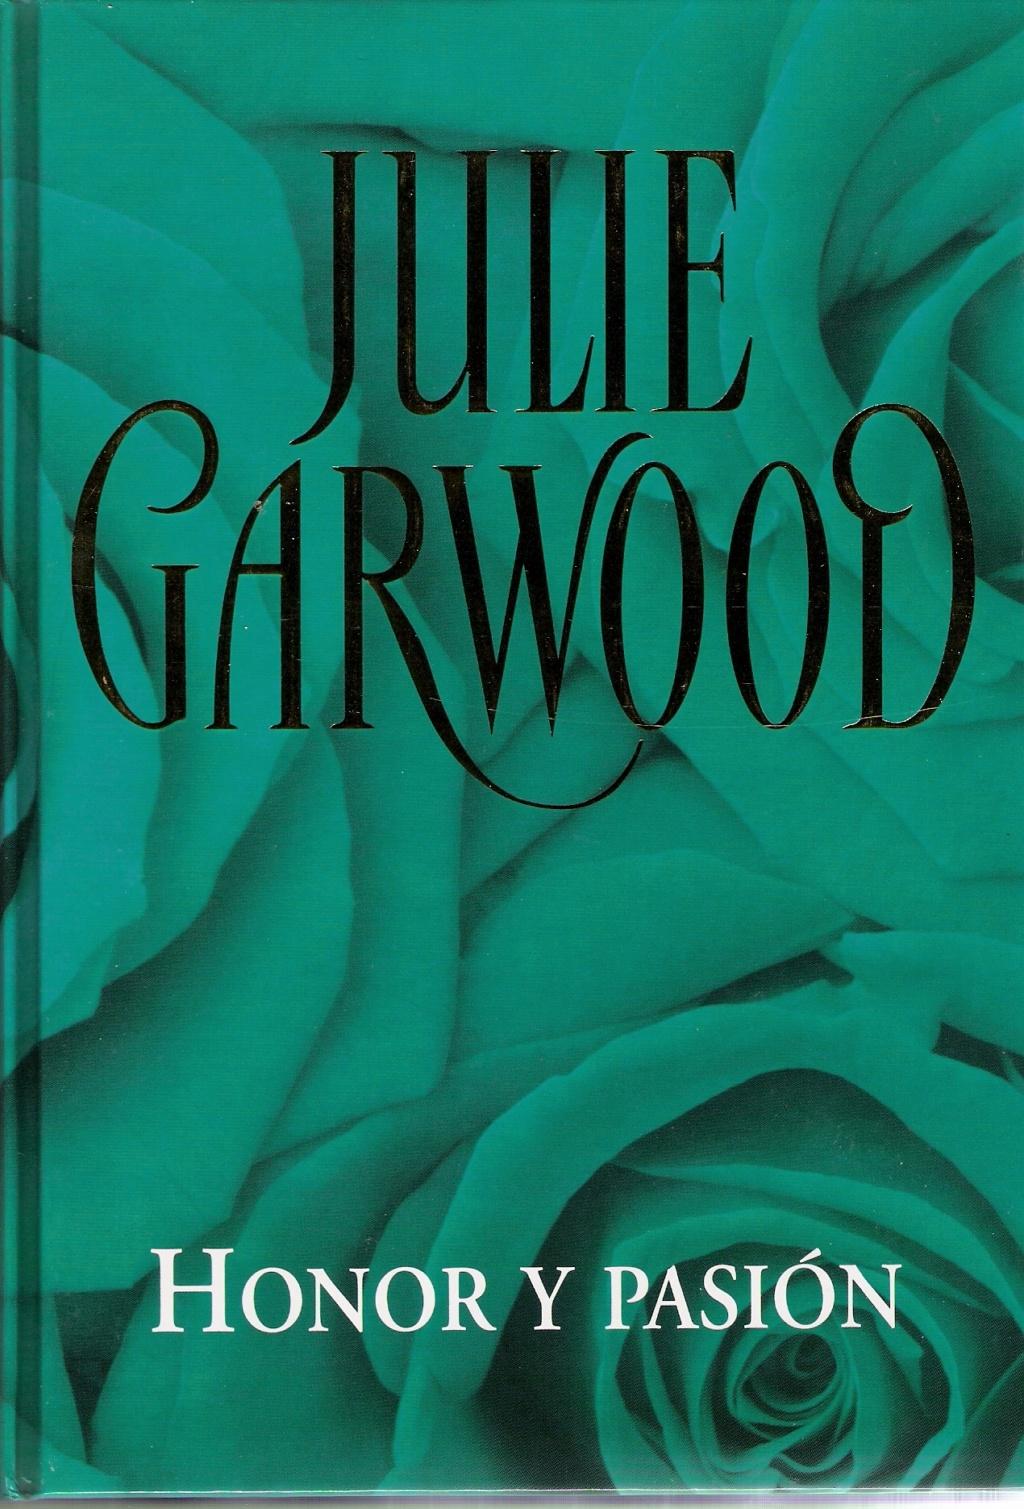 HONOR Y PASION - JULIE GARWOOD Phpthu10